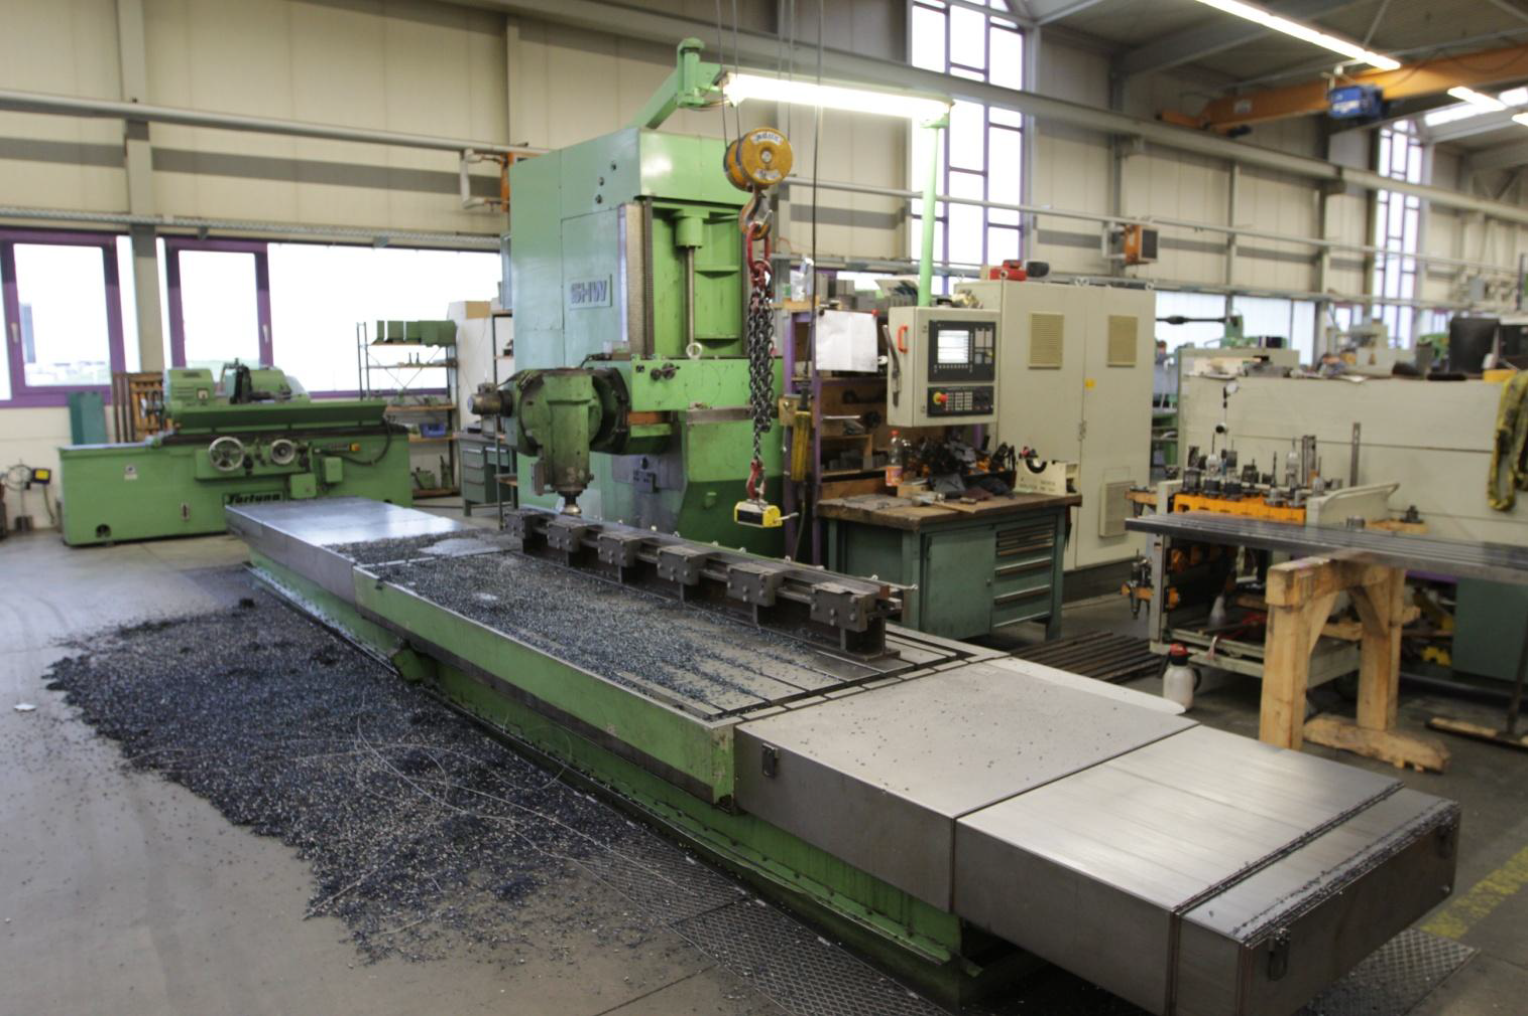 SHW UF 4 Cnc universal milling machine - Exapro